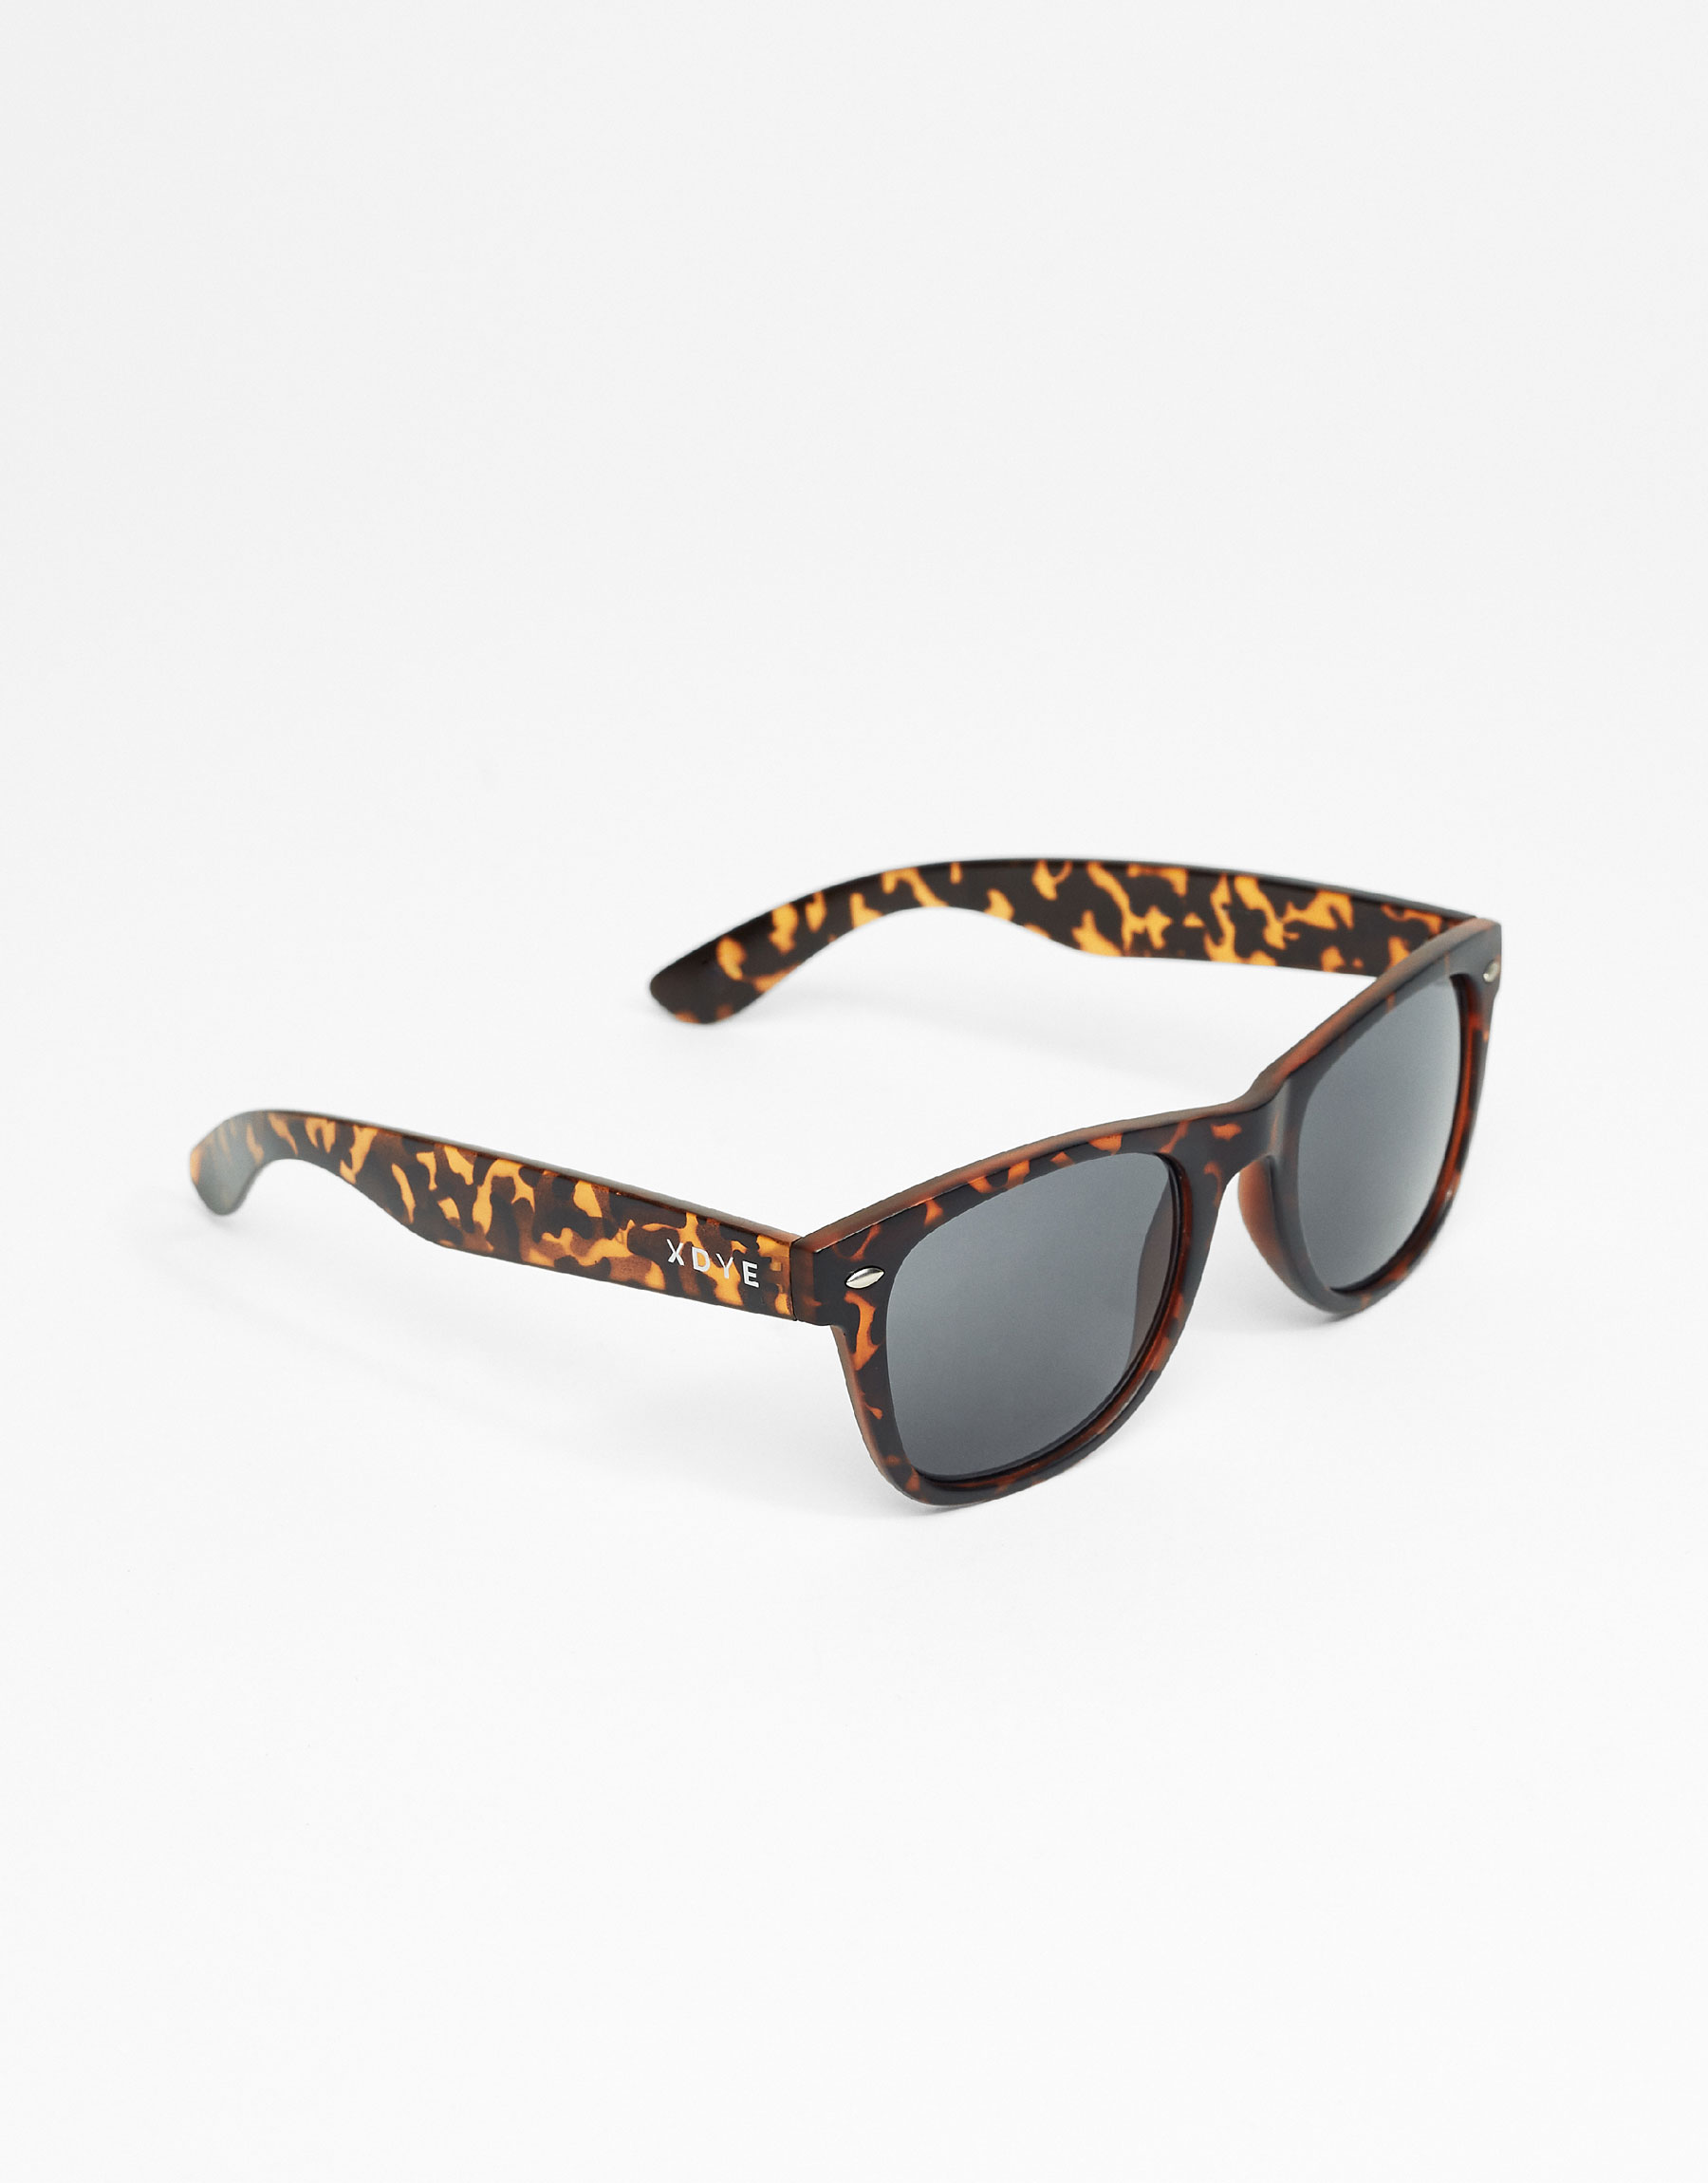 Gafas XDYE - Fantasia Carey